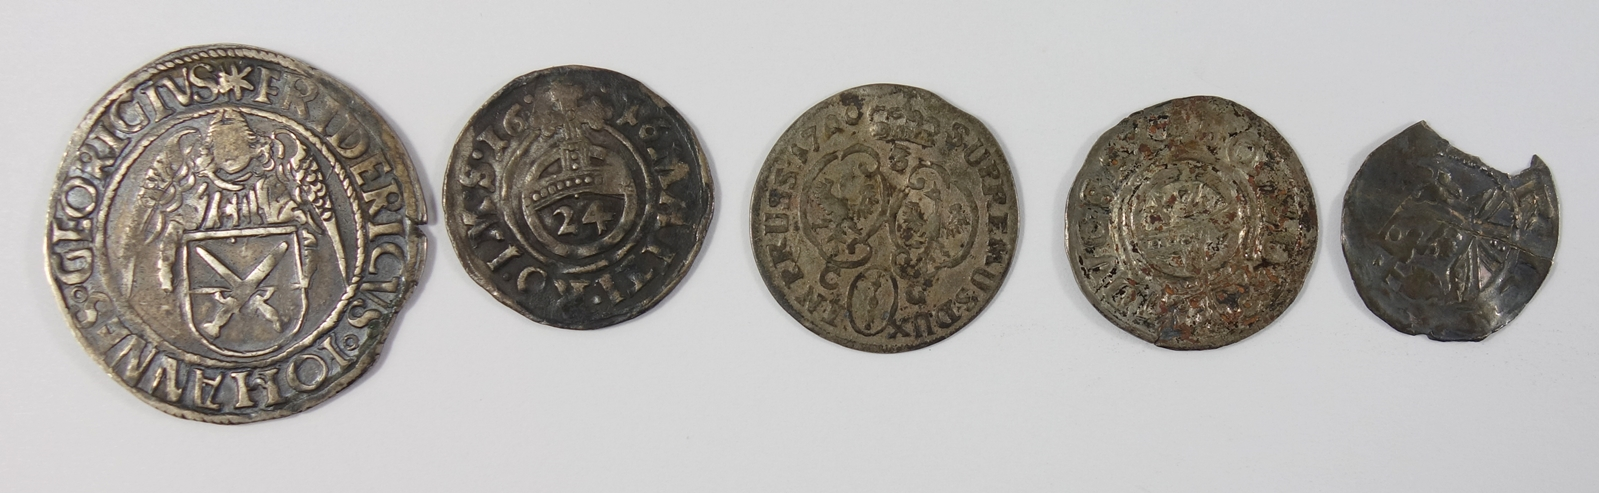 Konvolut 5 silberne Kleinmünzen, 18.Jh., u.a. Engelsgroschen (Schreckenberger) o.J., Friedrich III., - Bild 2 aus 2